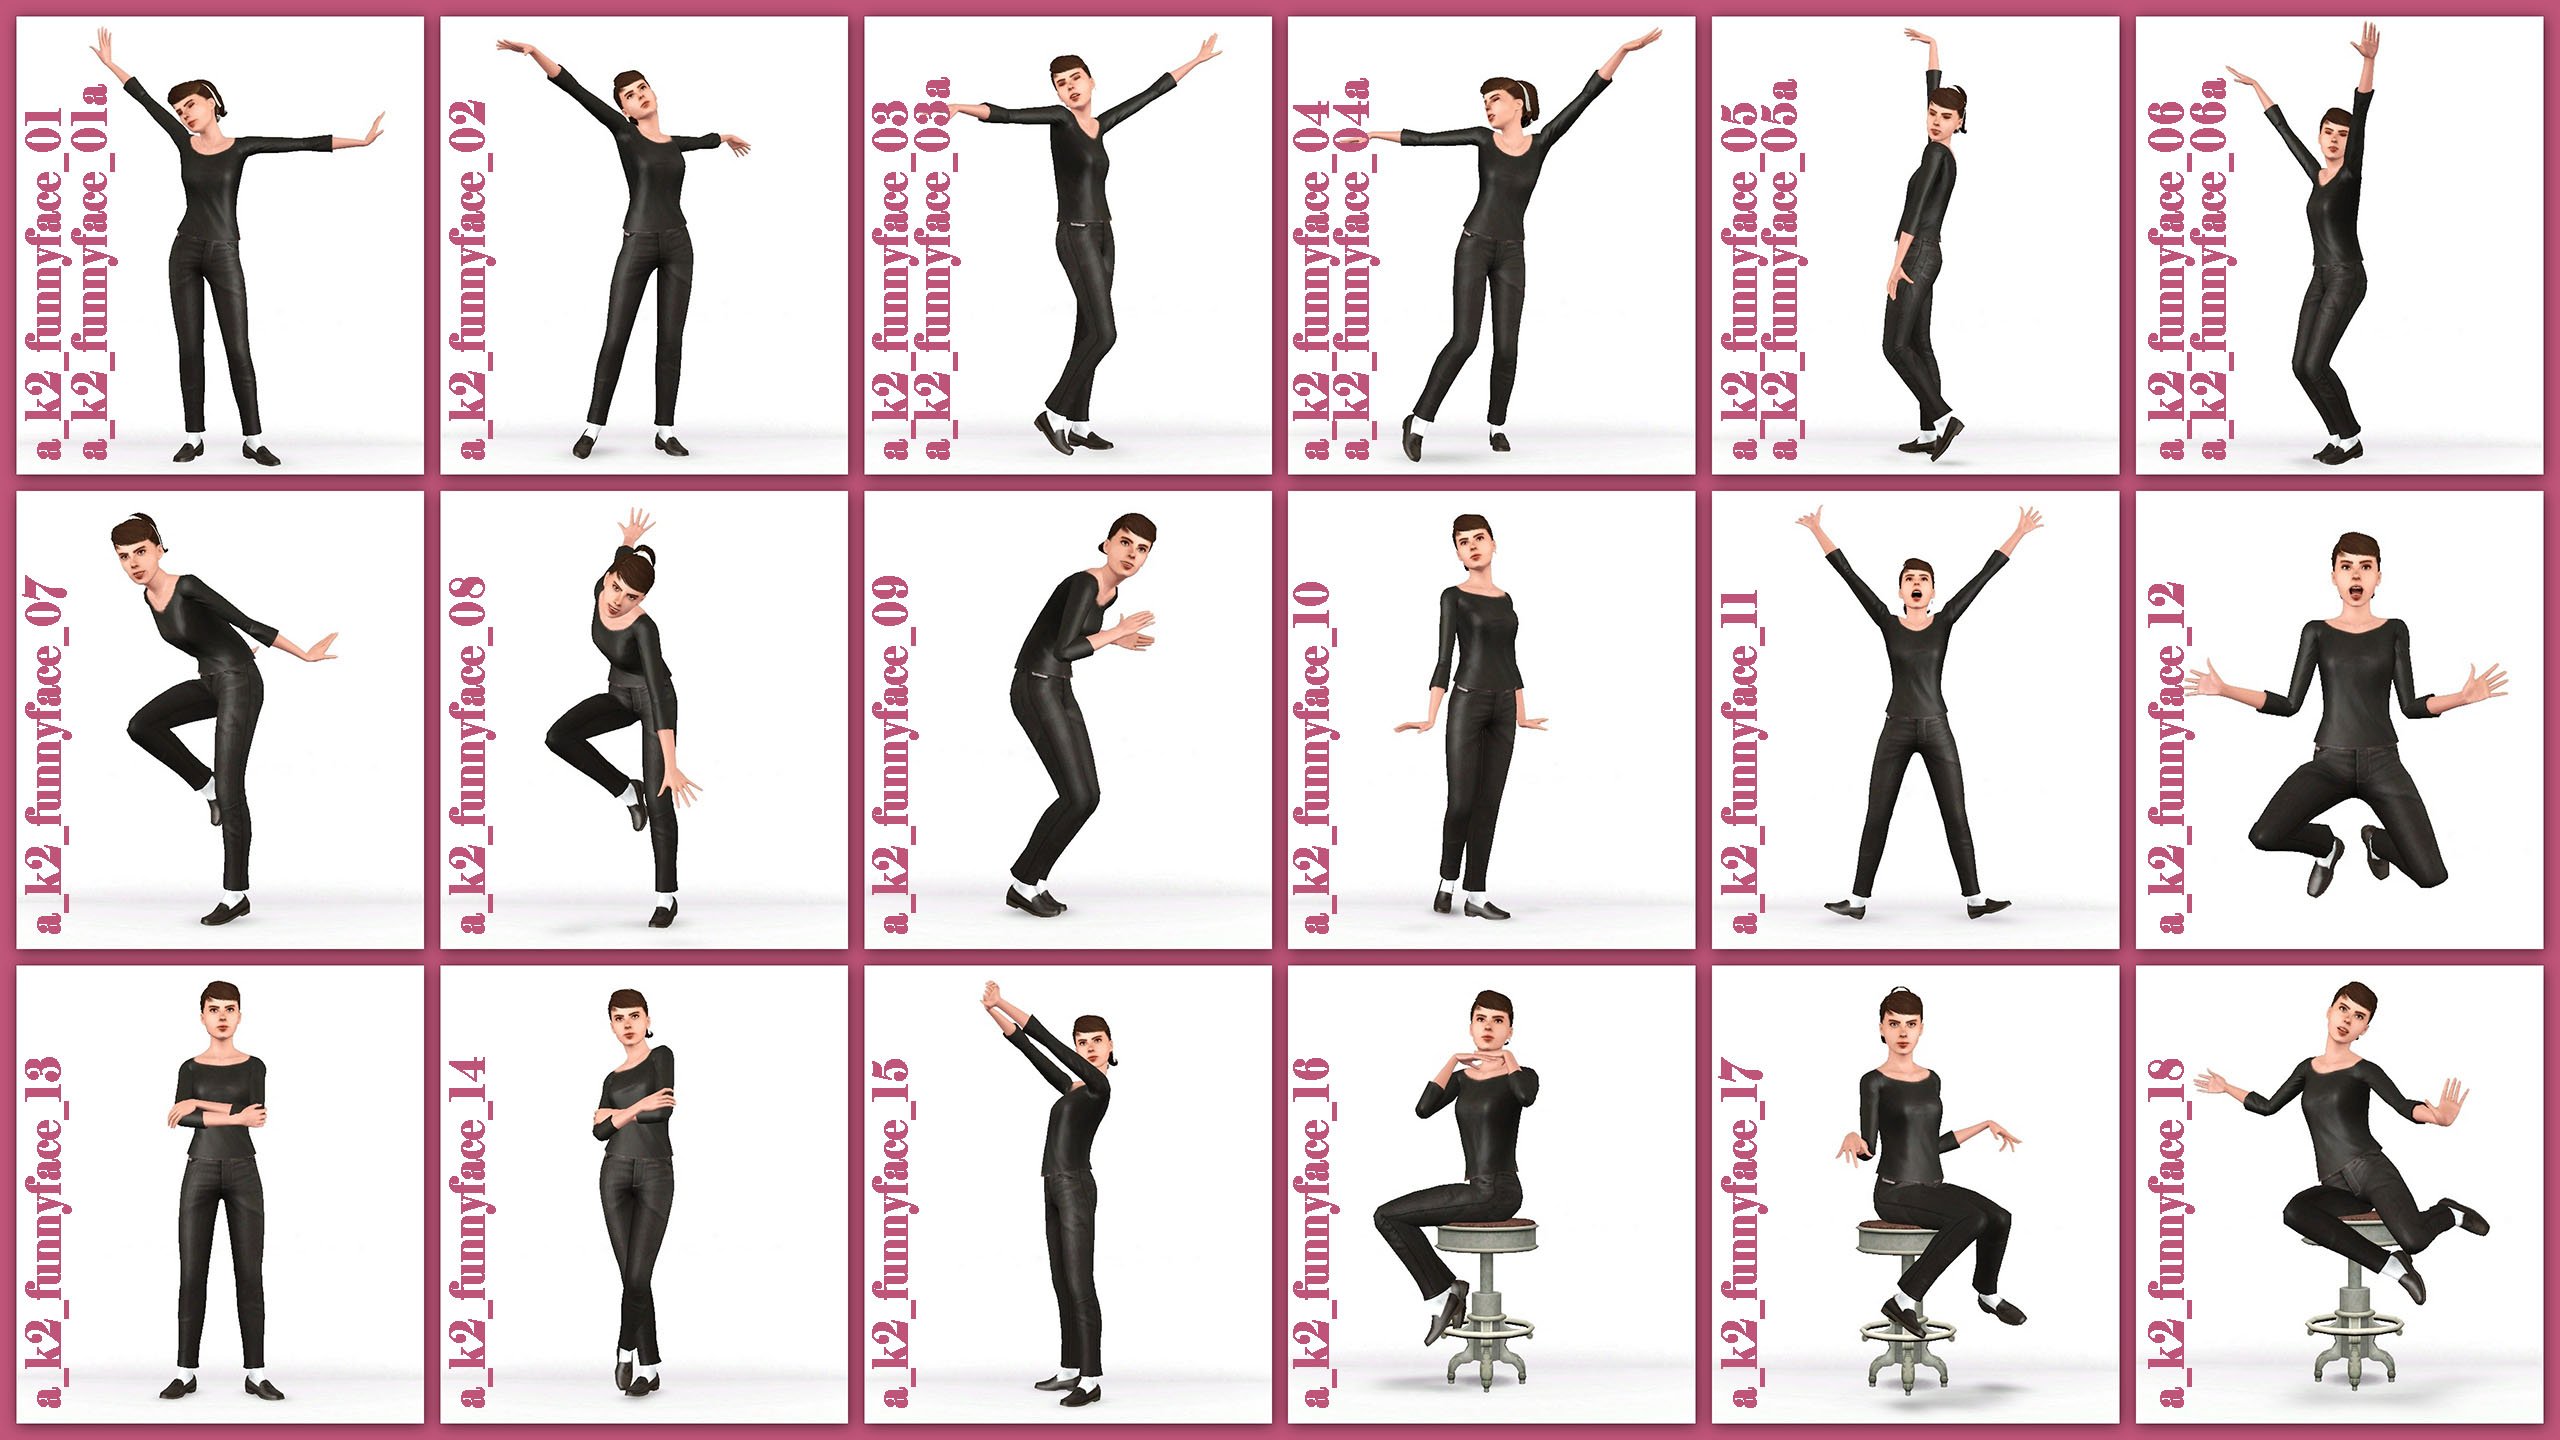 K2's Poses - Get Physical 14215590764_f7e0ef0fbb_o